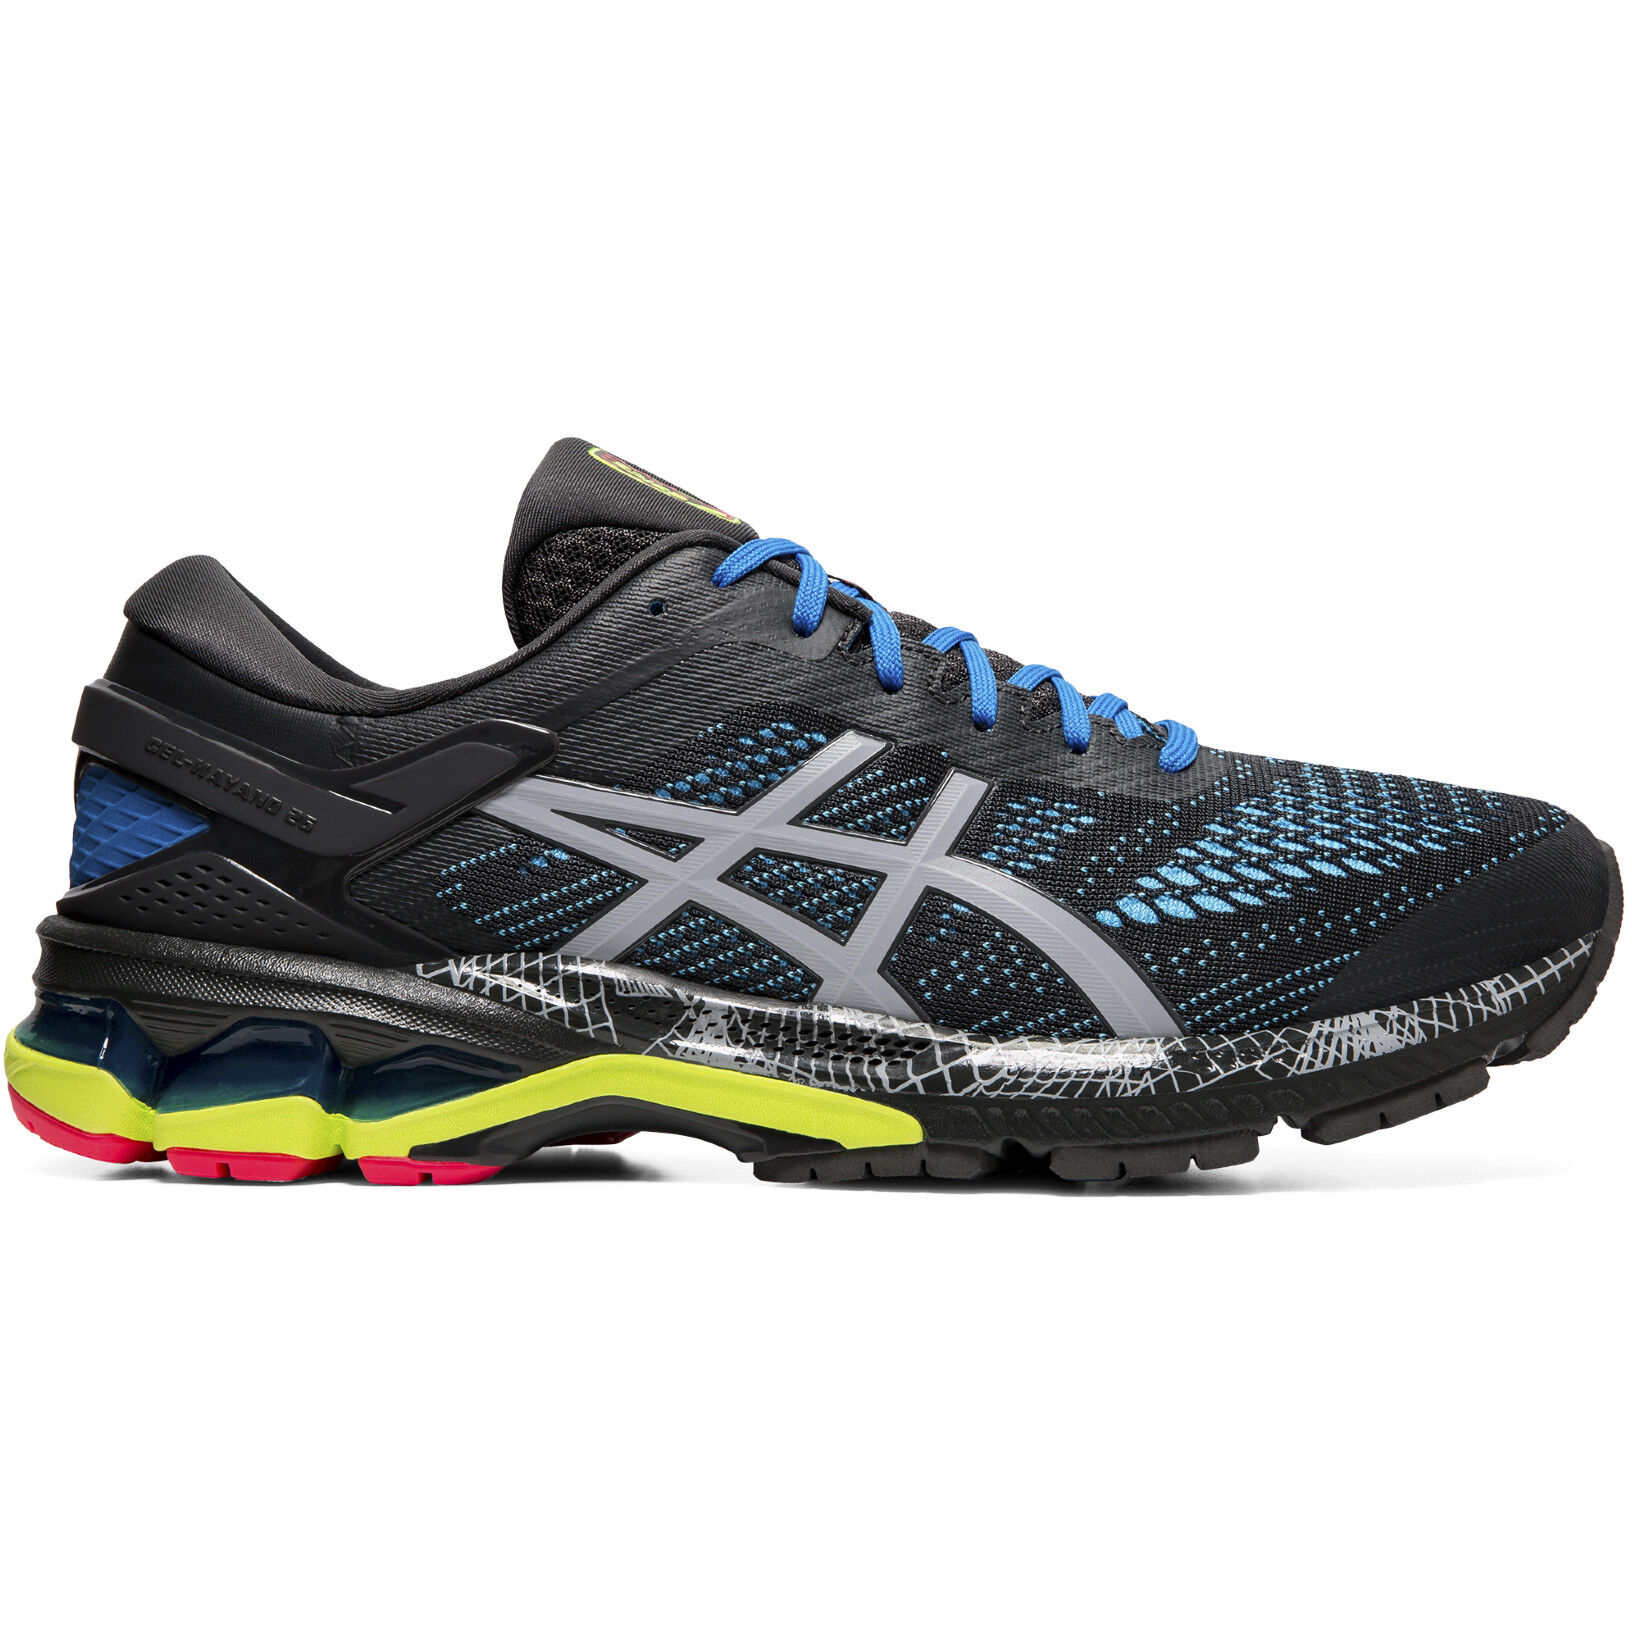 asics Gel Kayano 26 Lite Show Schuhe Herren graphite greypiedmont grey